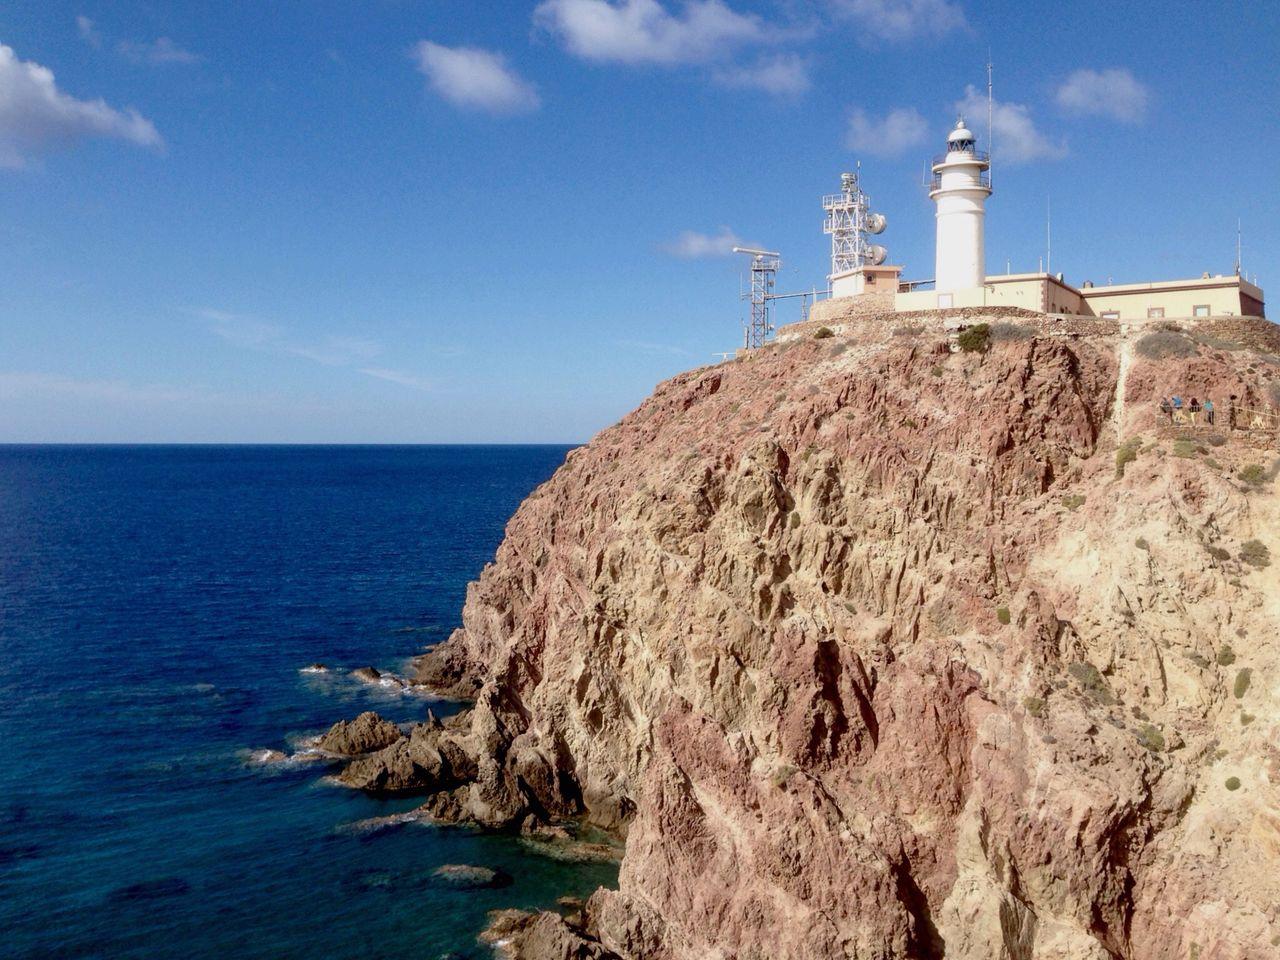 Lighthouse On Mountain By Sea Against Sky